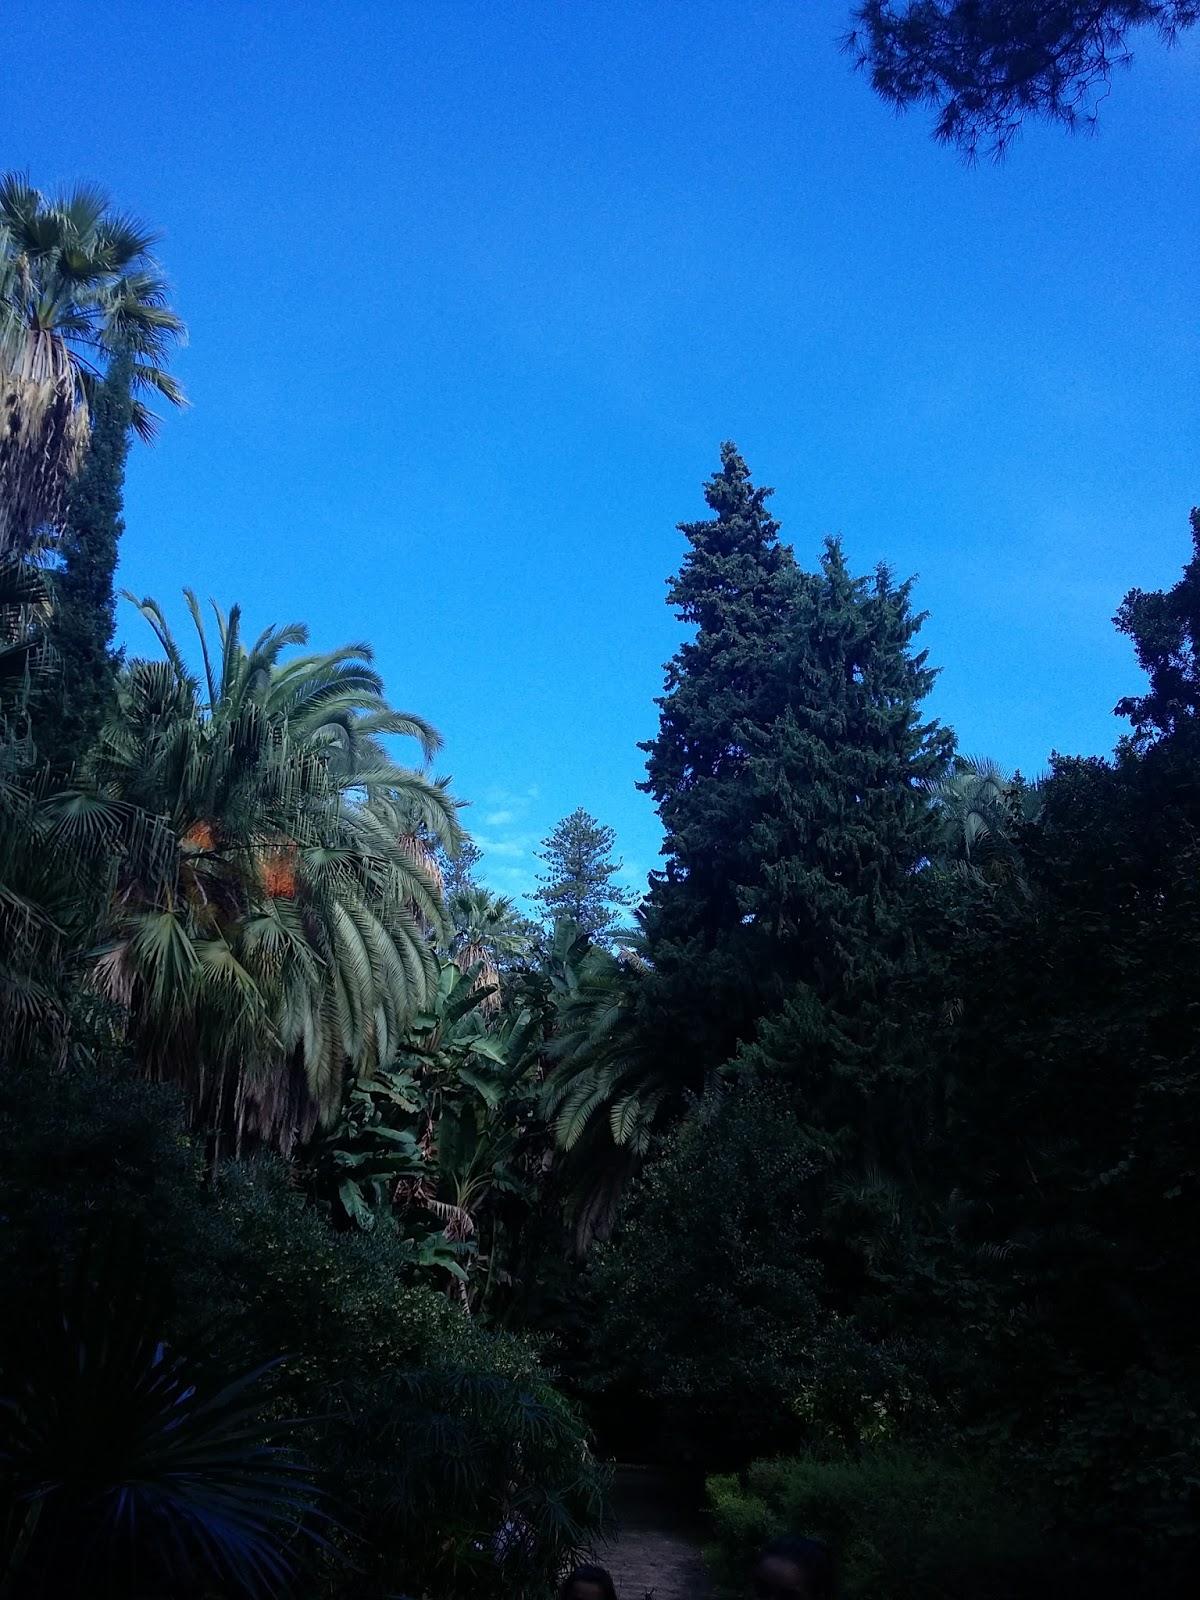 Ceip alegr a de la huerta m laga visita al jard n for Ceip jardin botanico